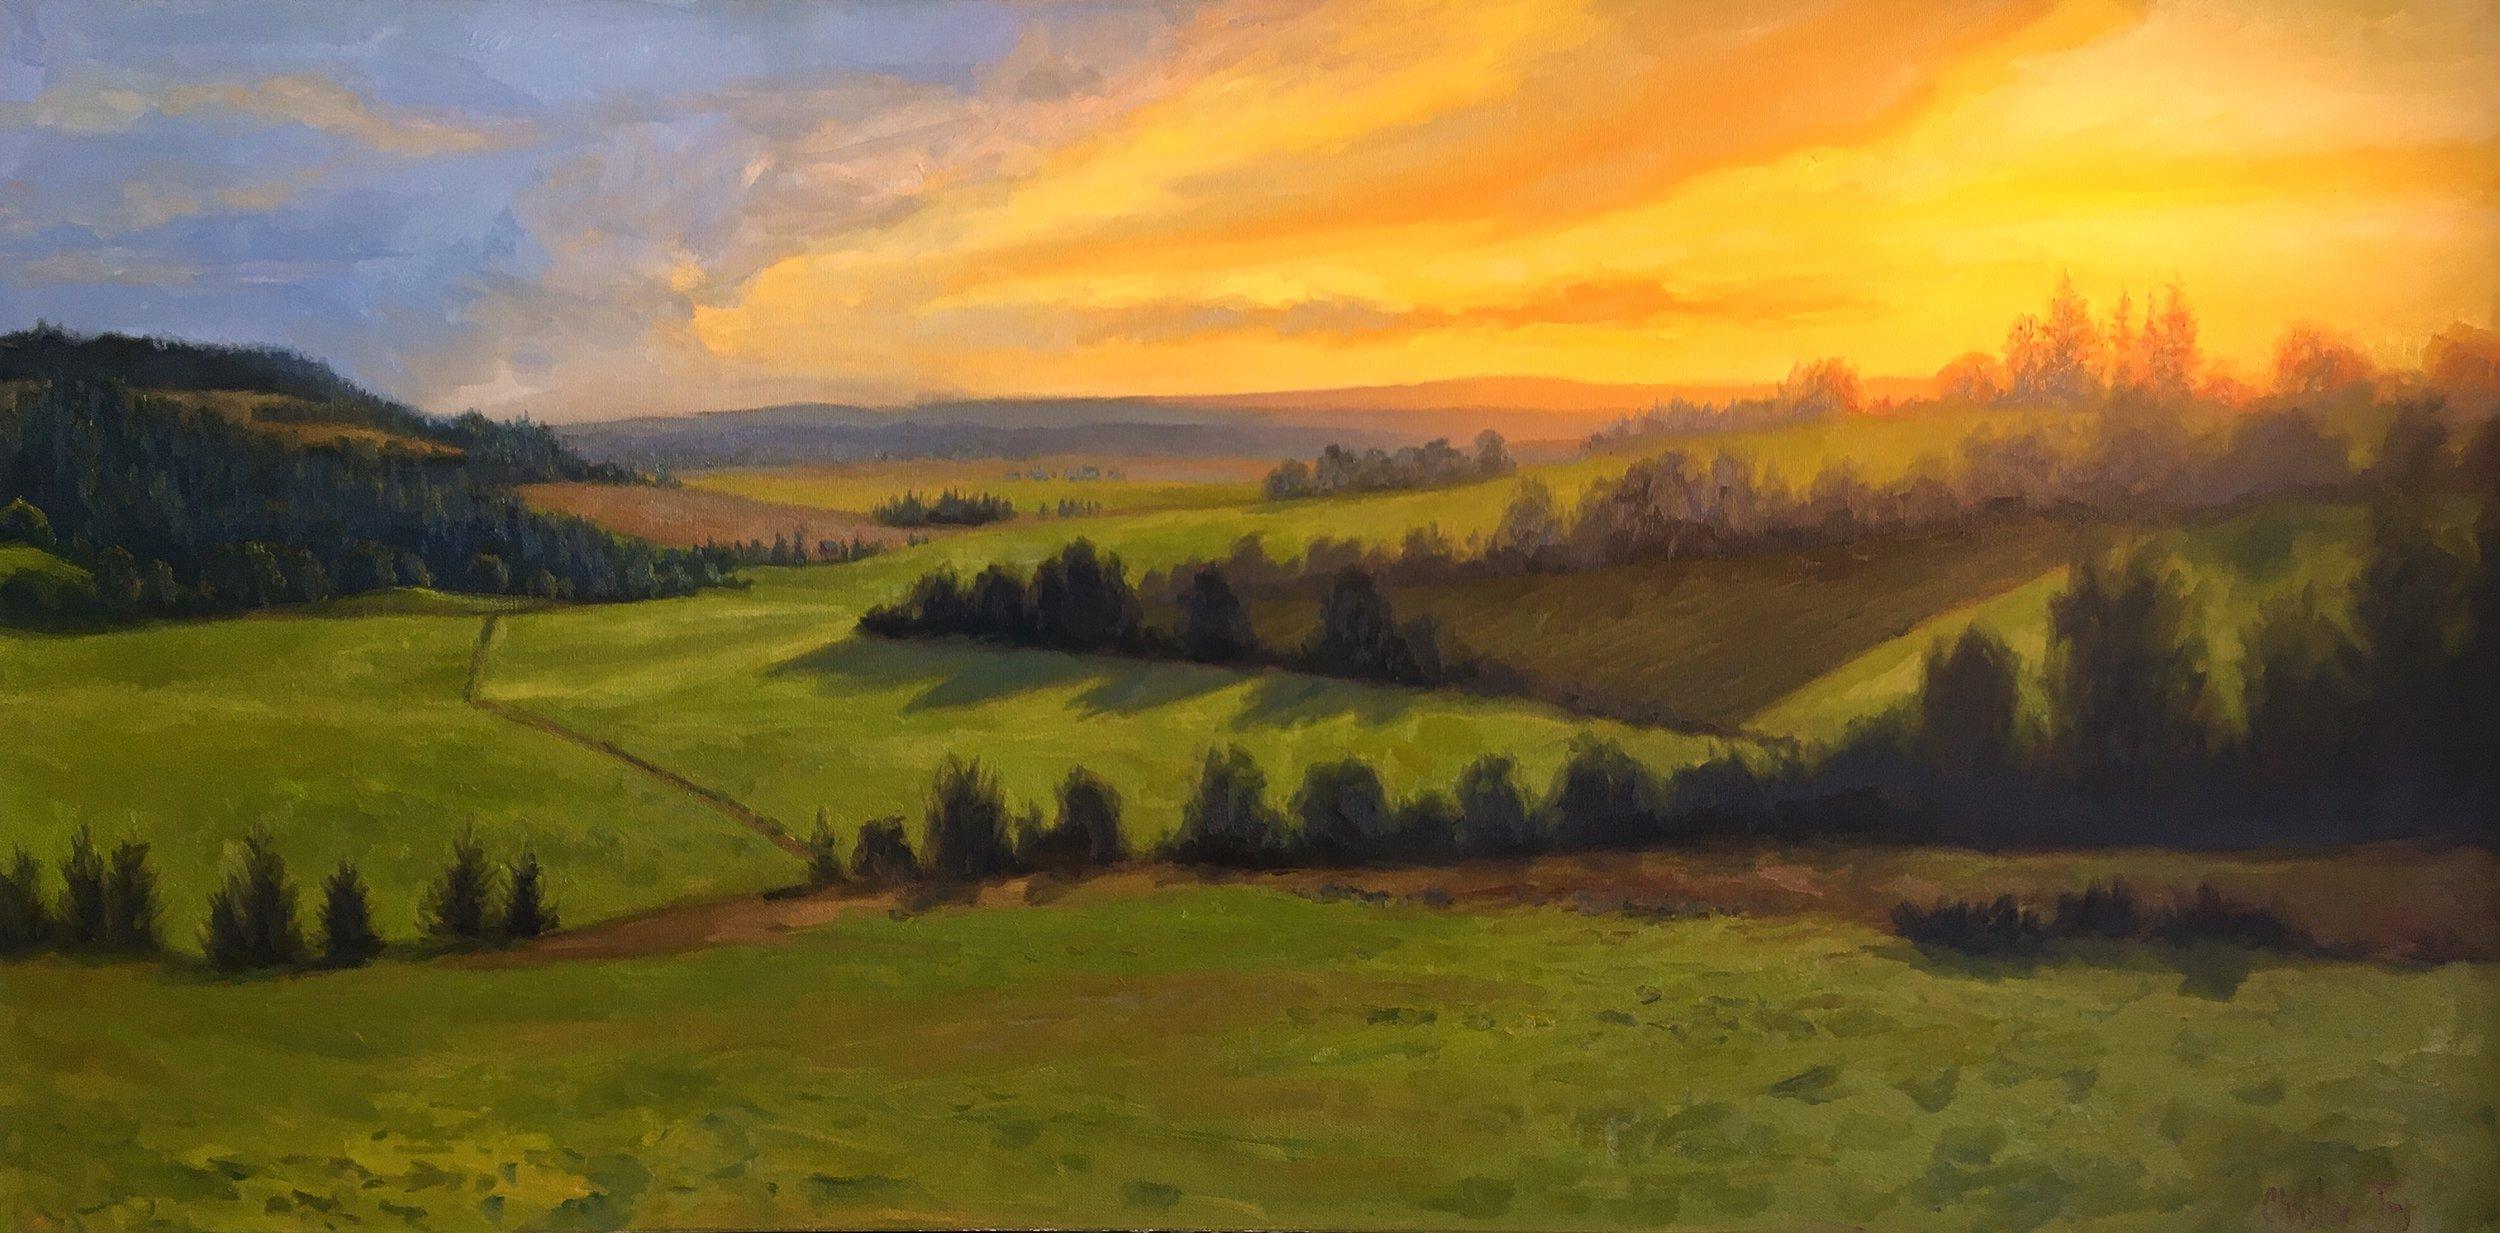 Sunset at Dukes Vineyard